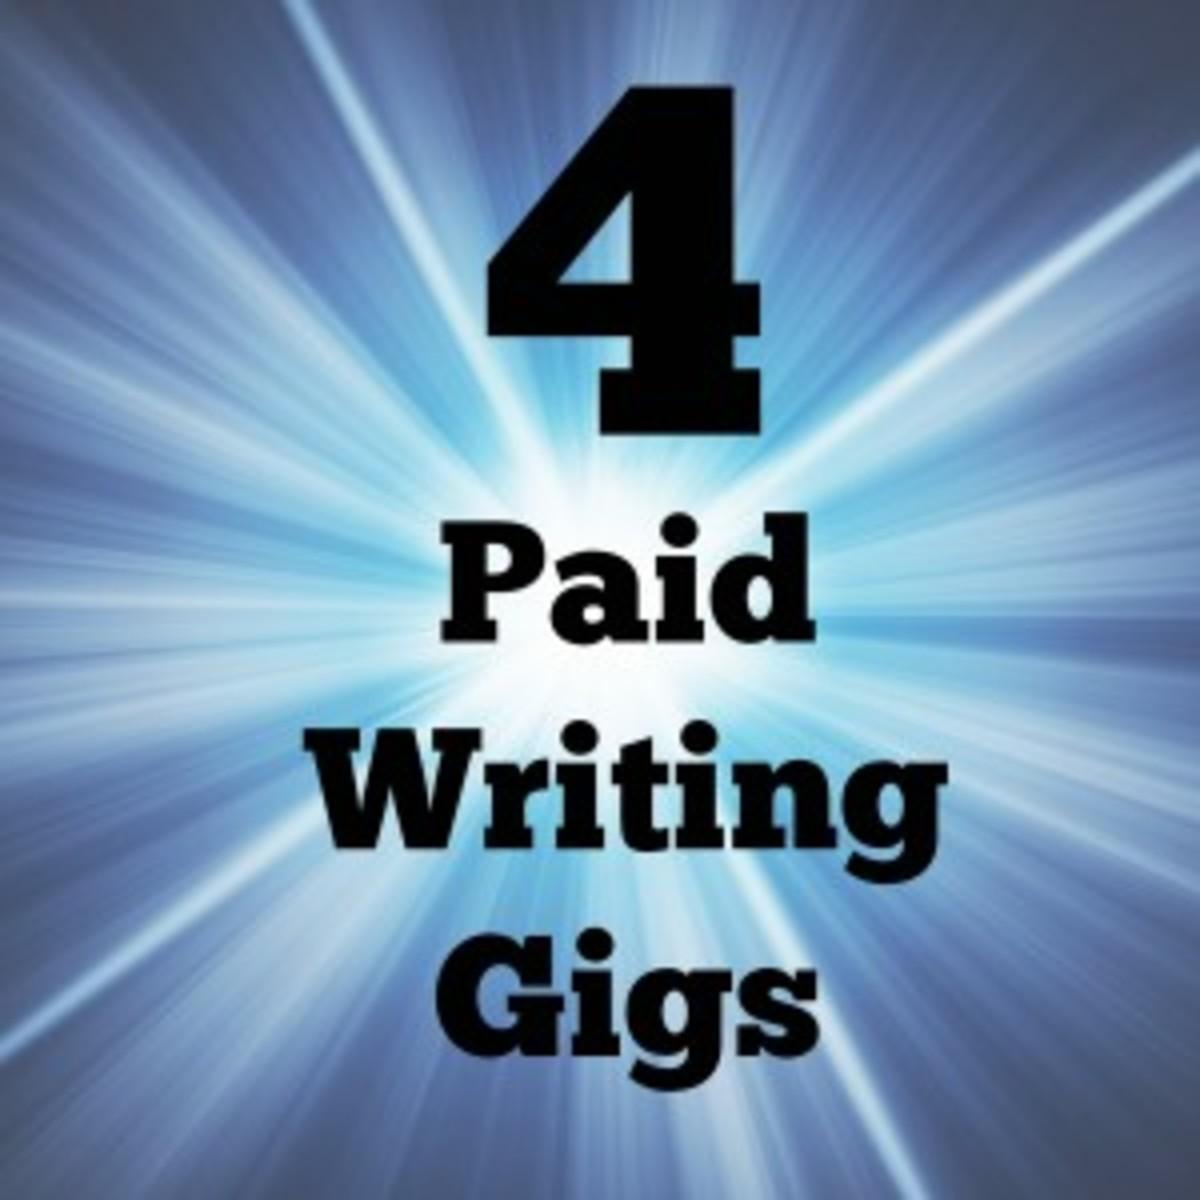 4 Paid Writing Gigs